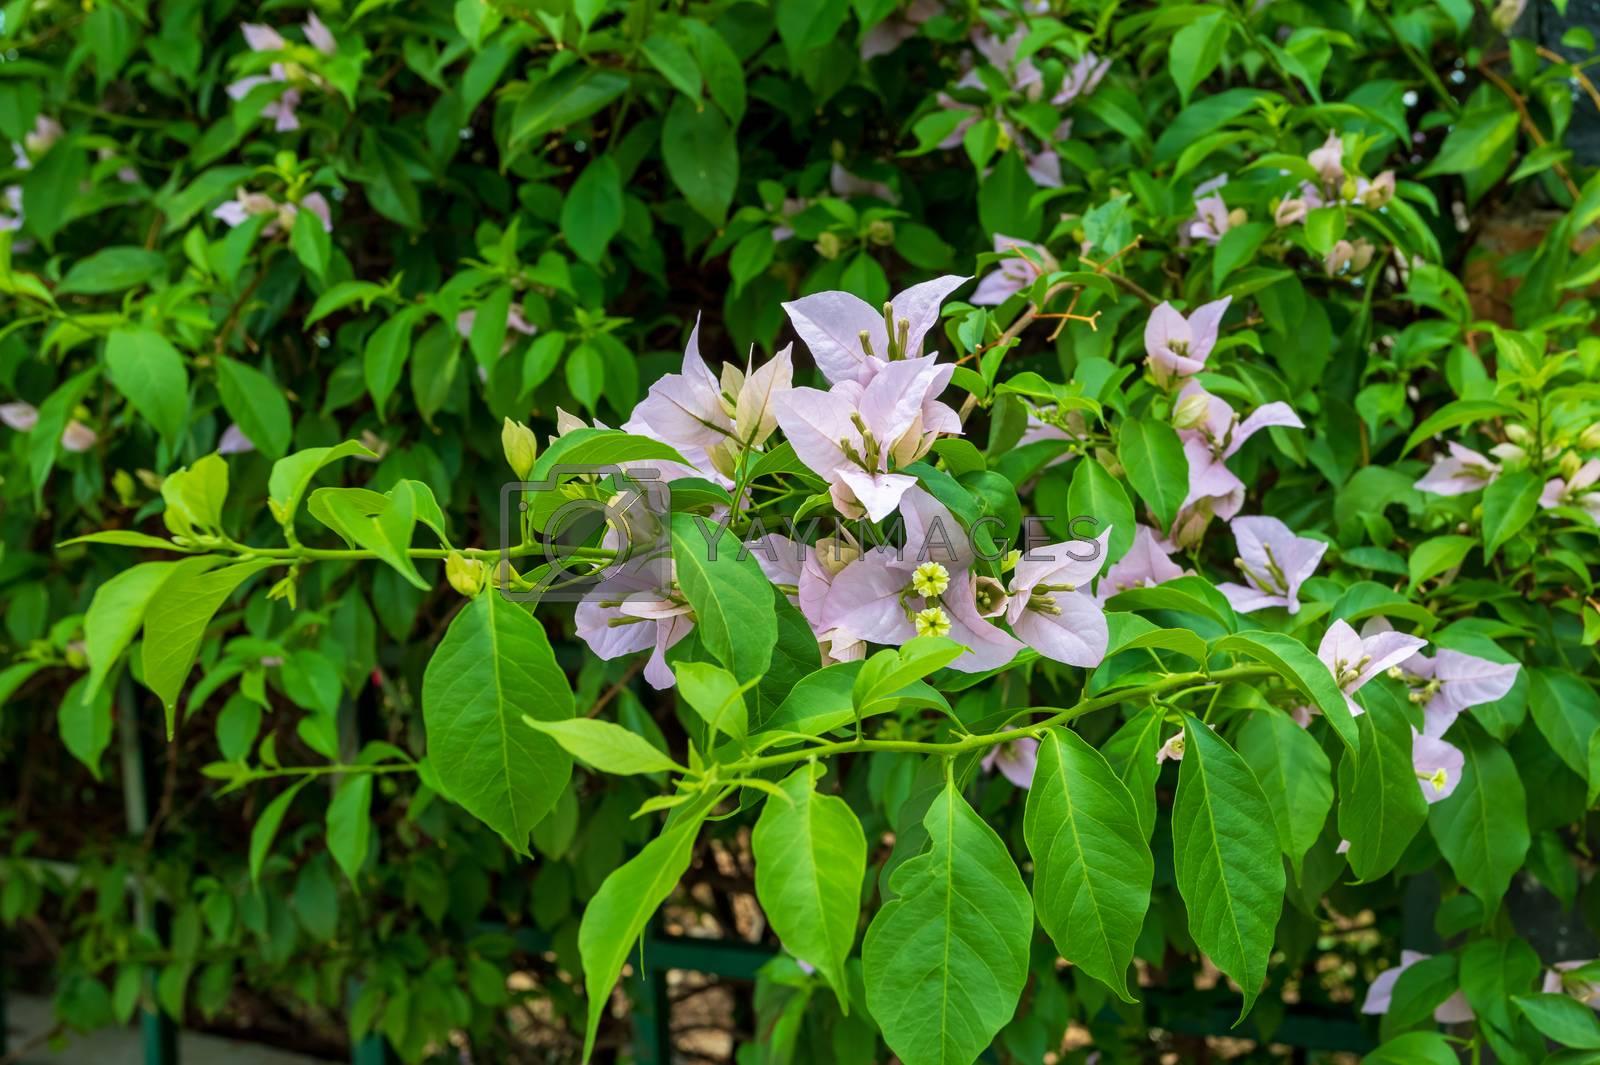 Exotic Bougainvillea flower blooming in the garden, Ethiopia